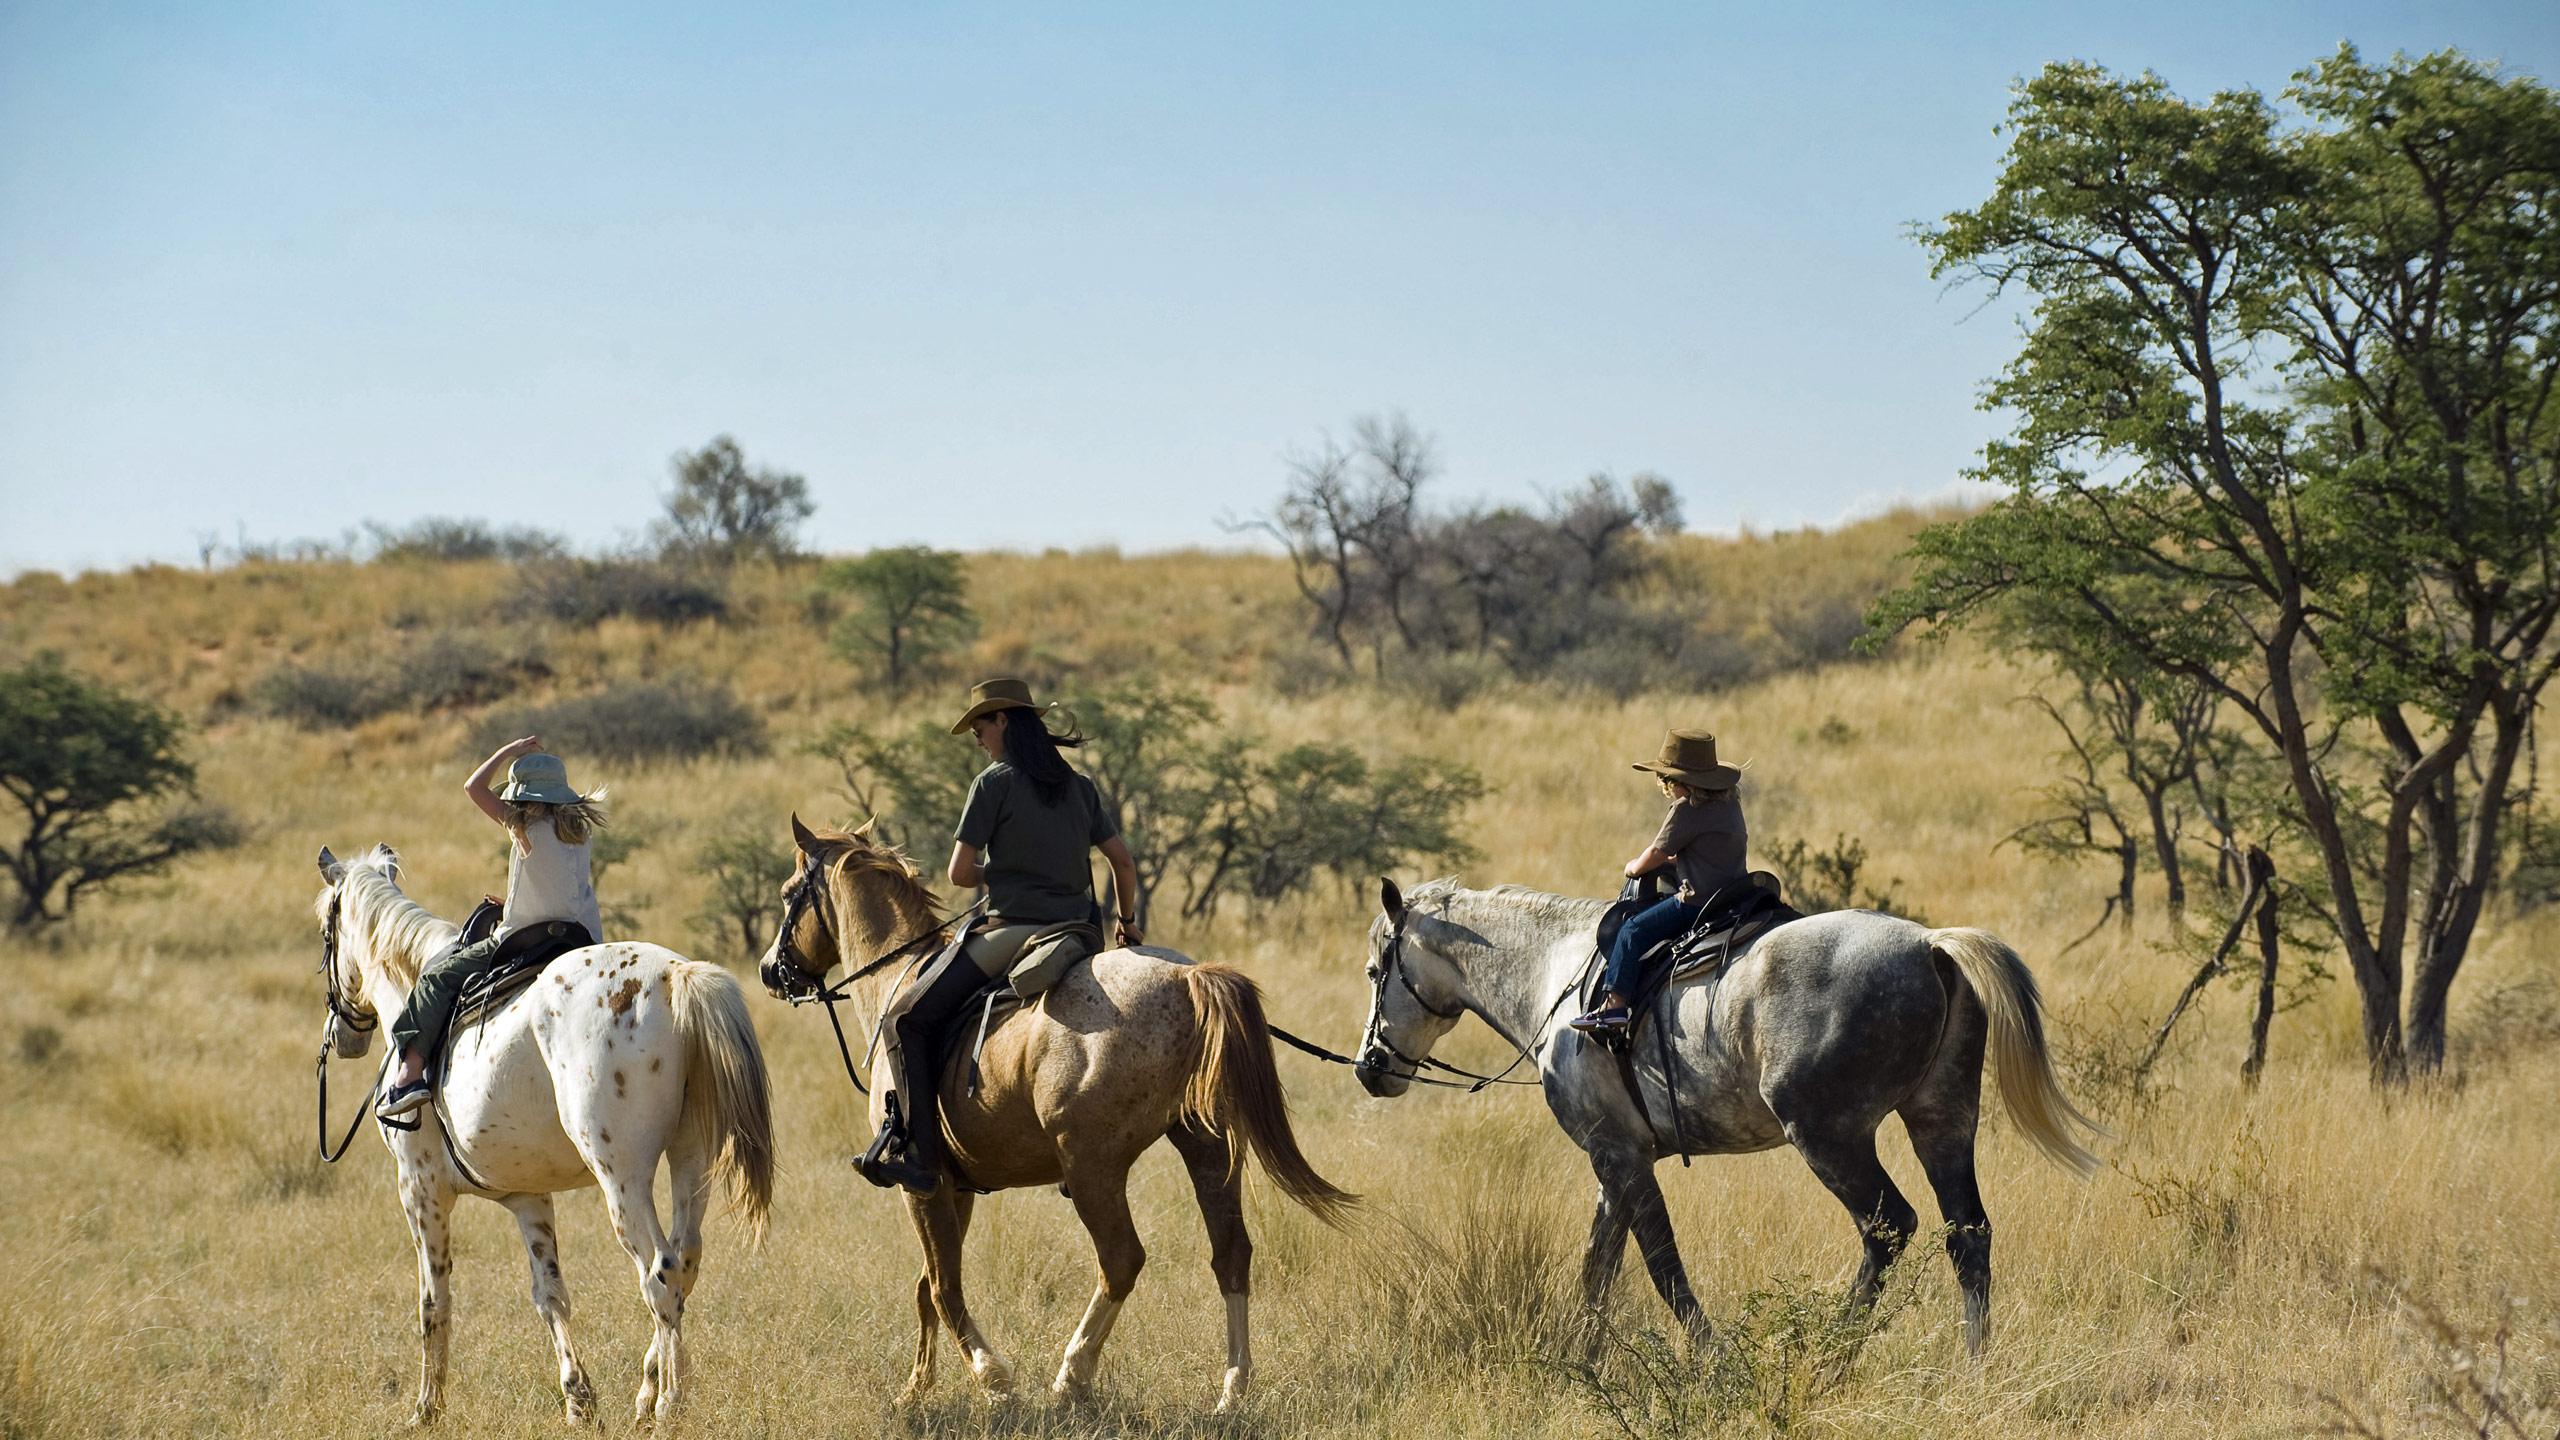 10 Horseback Safaris in the African Wilderness | HuffPost